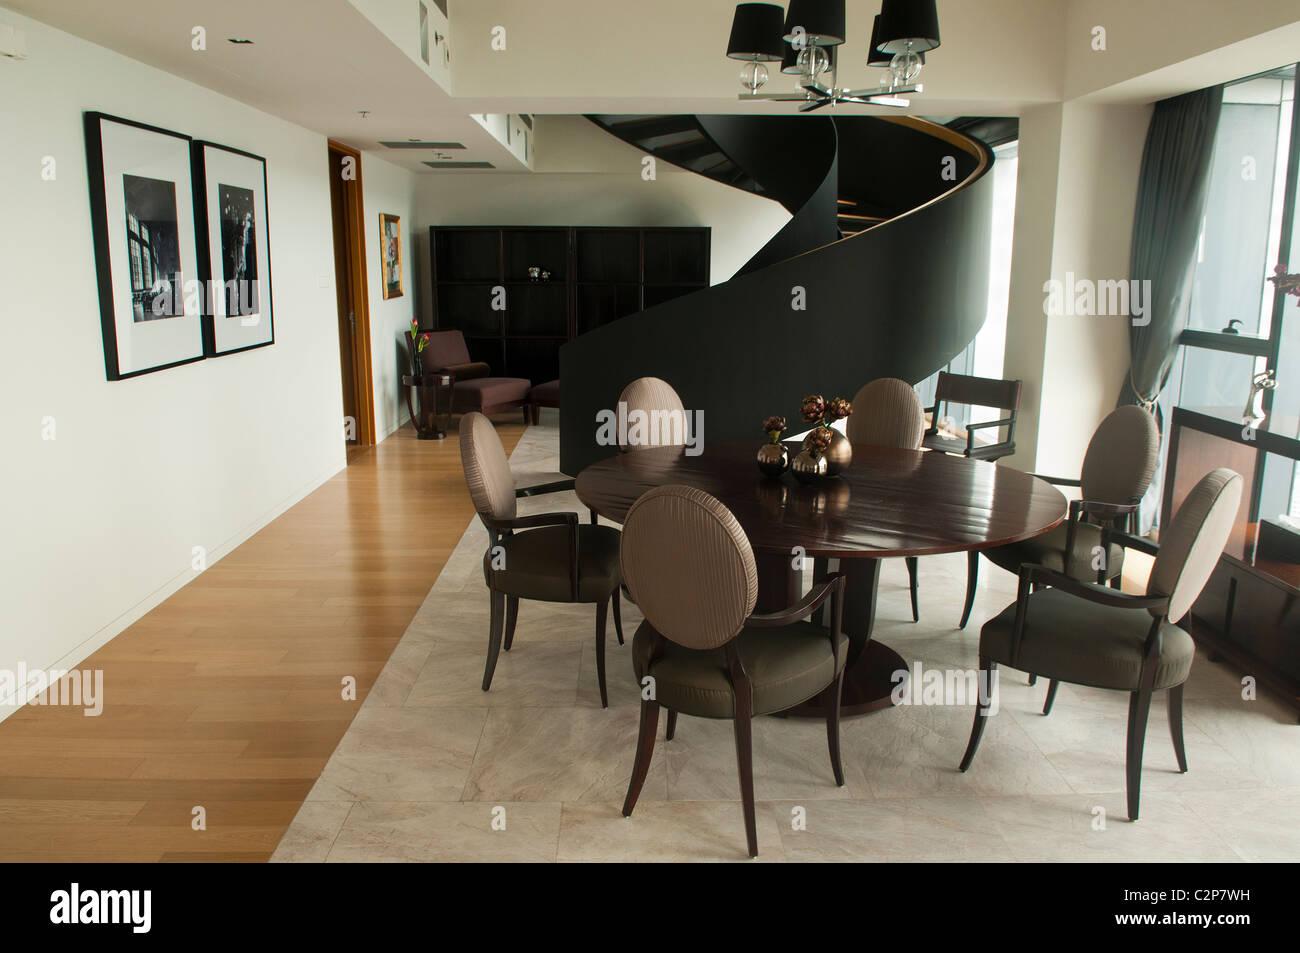 chair design bangkok student desk and set interior layout at a condominium in thailand